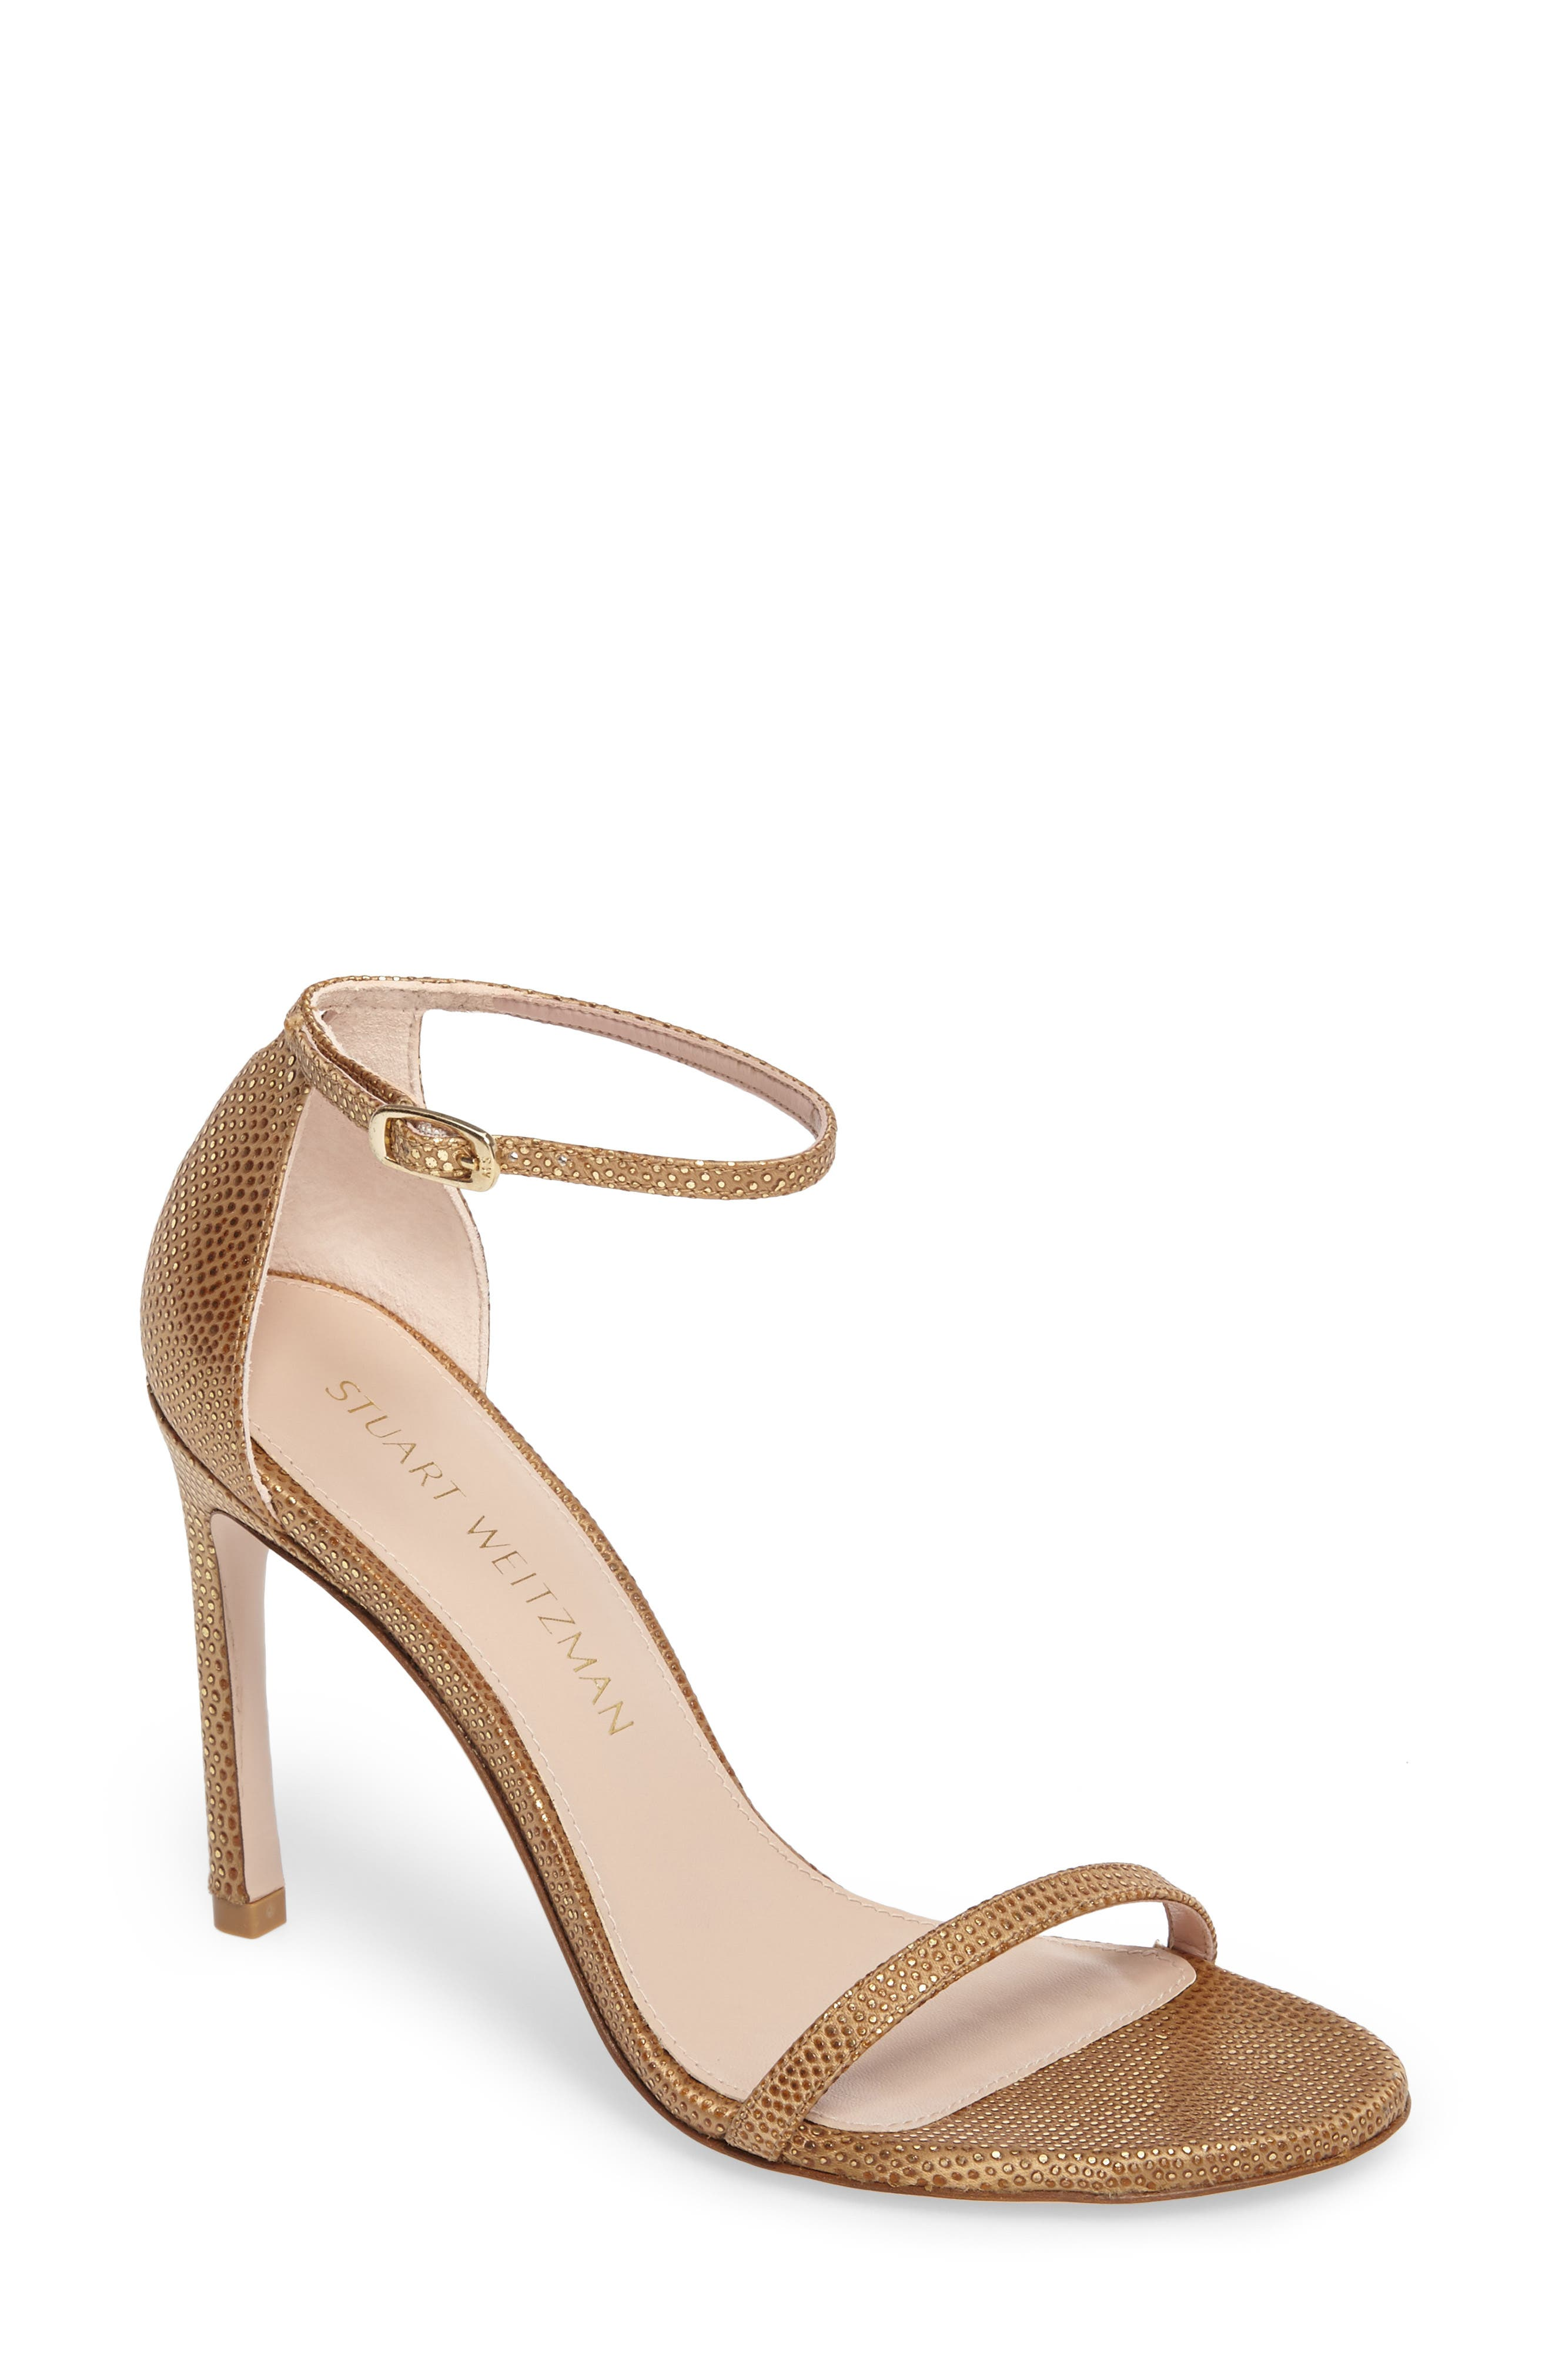 Nudistsong Ankle Strap Sandal,                         Main,                         color, Gold Dot